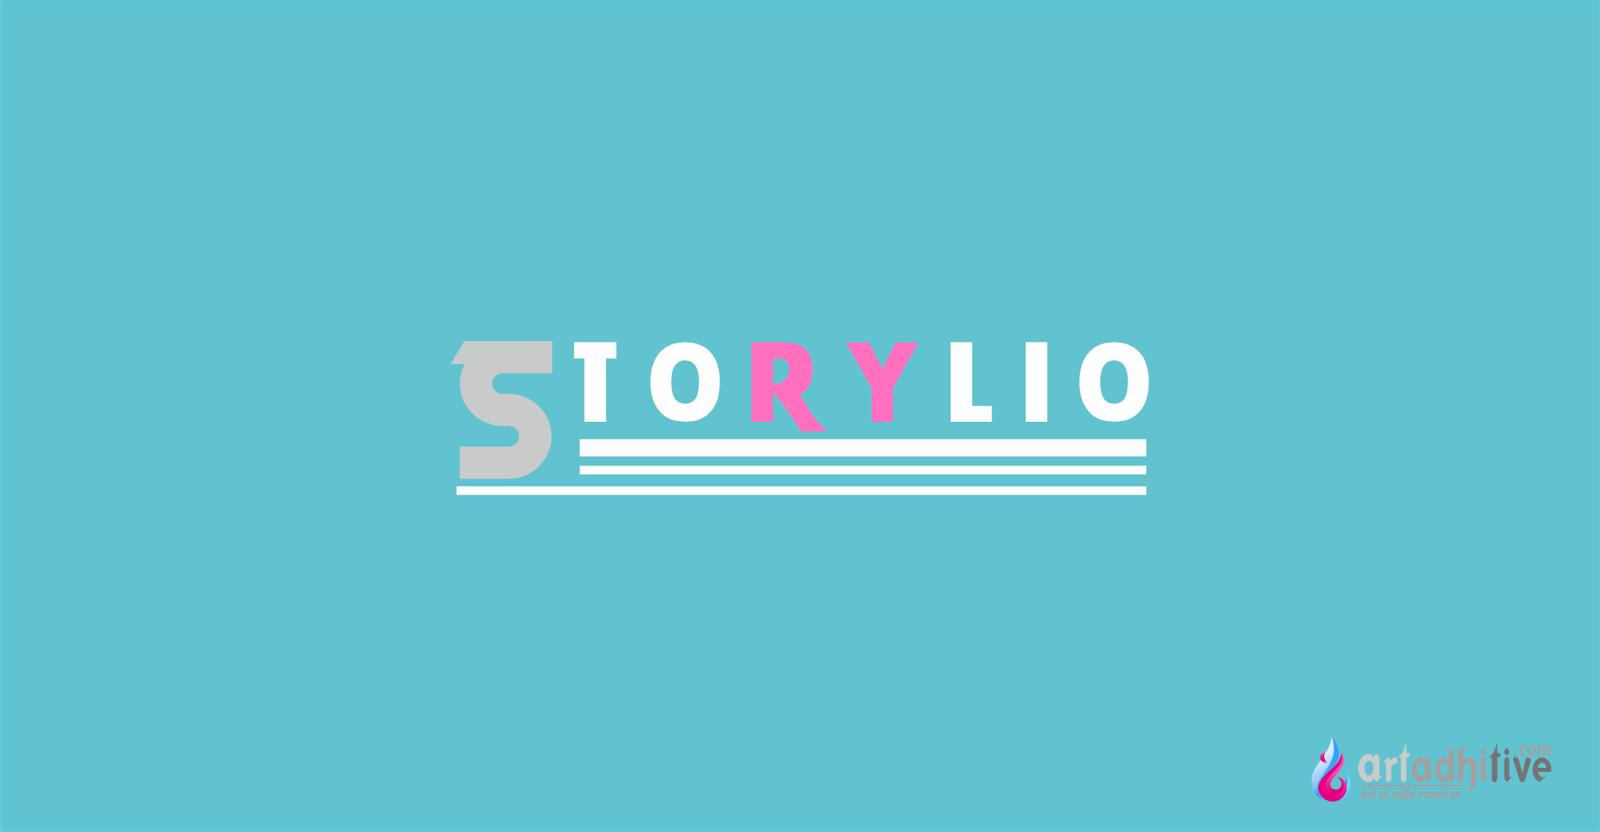 Storylio